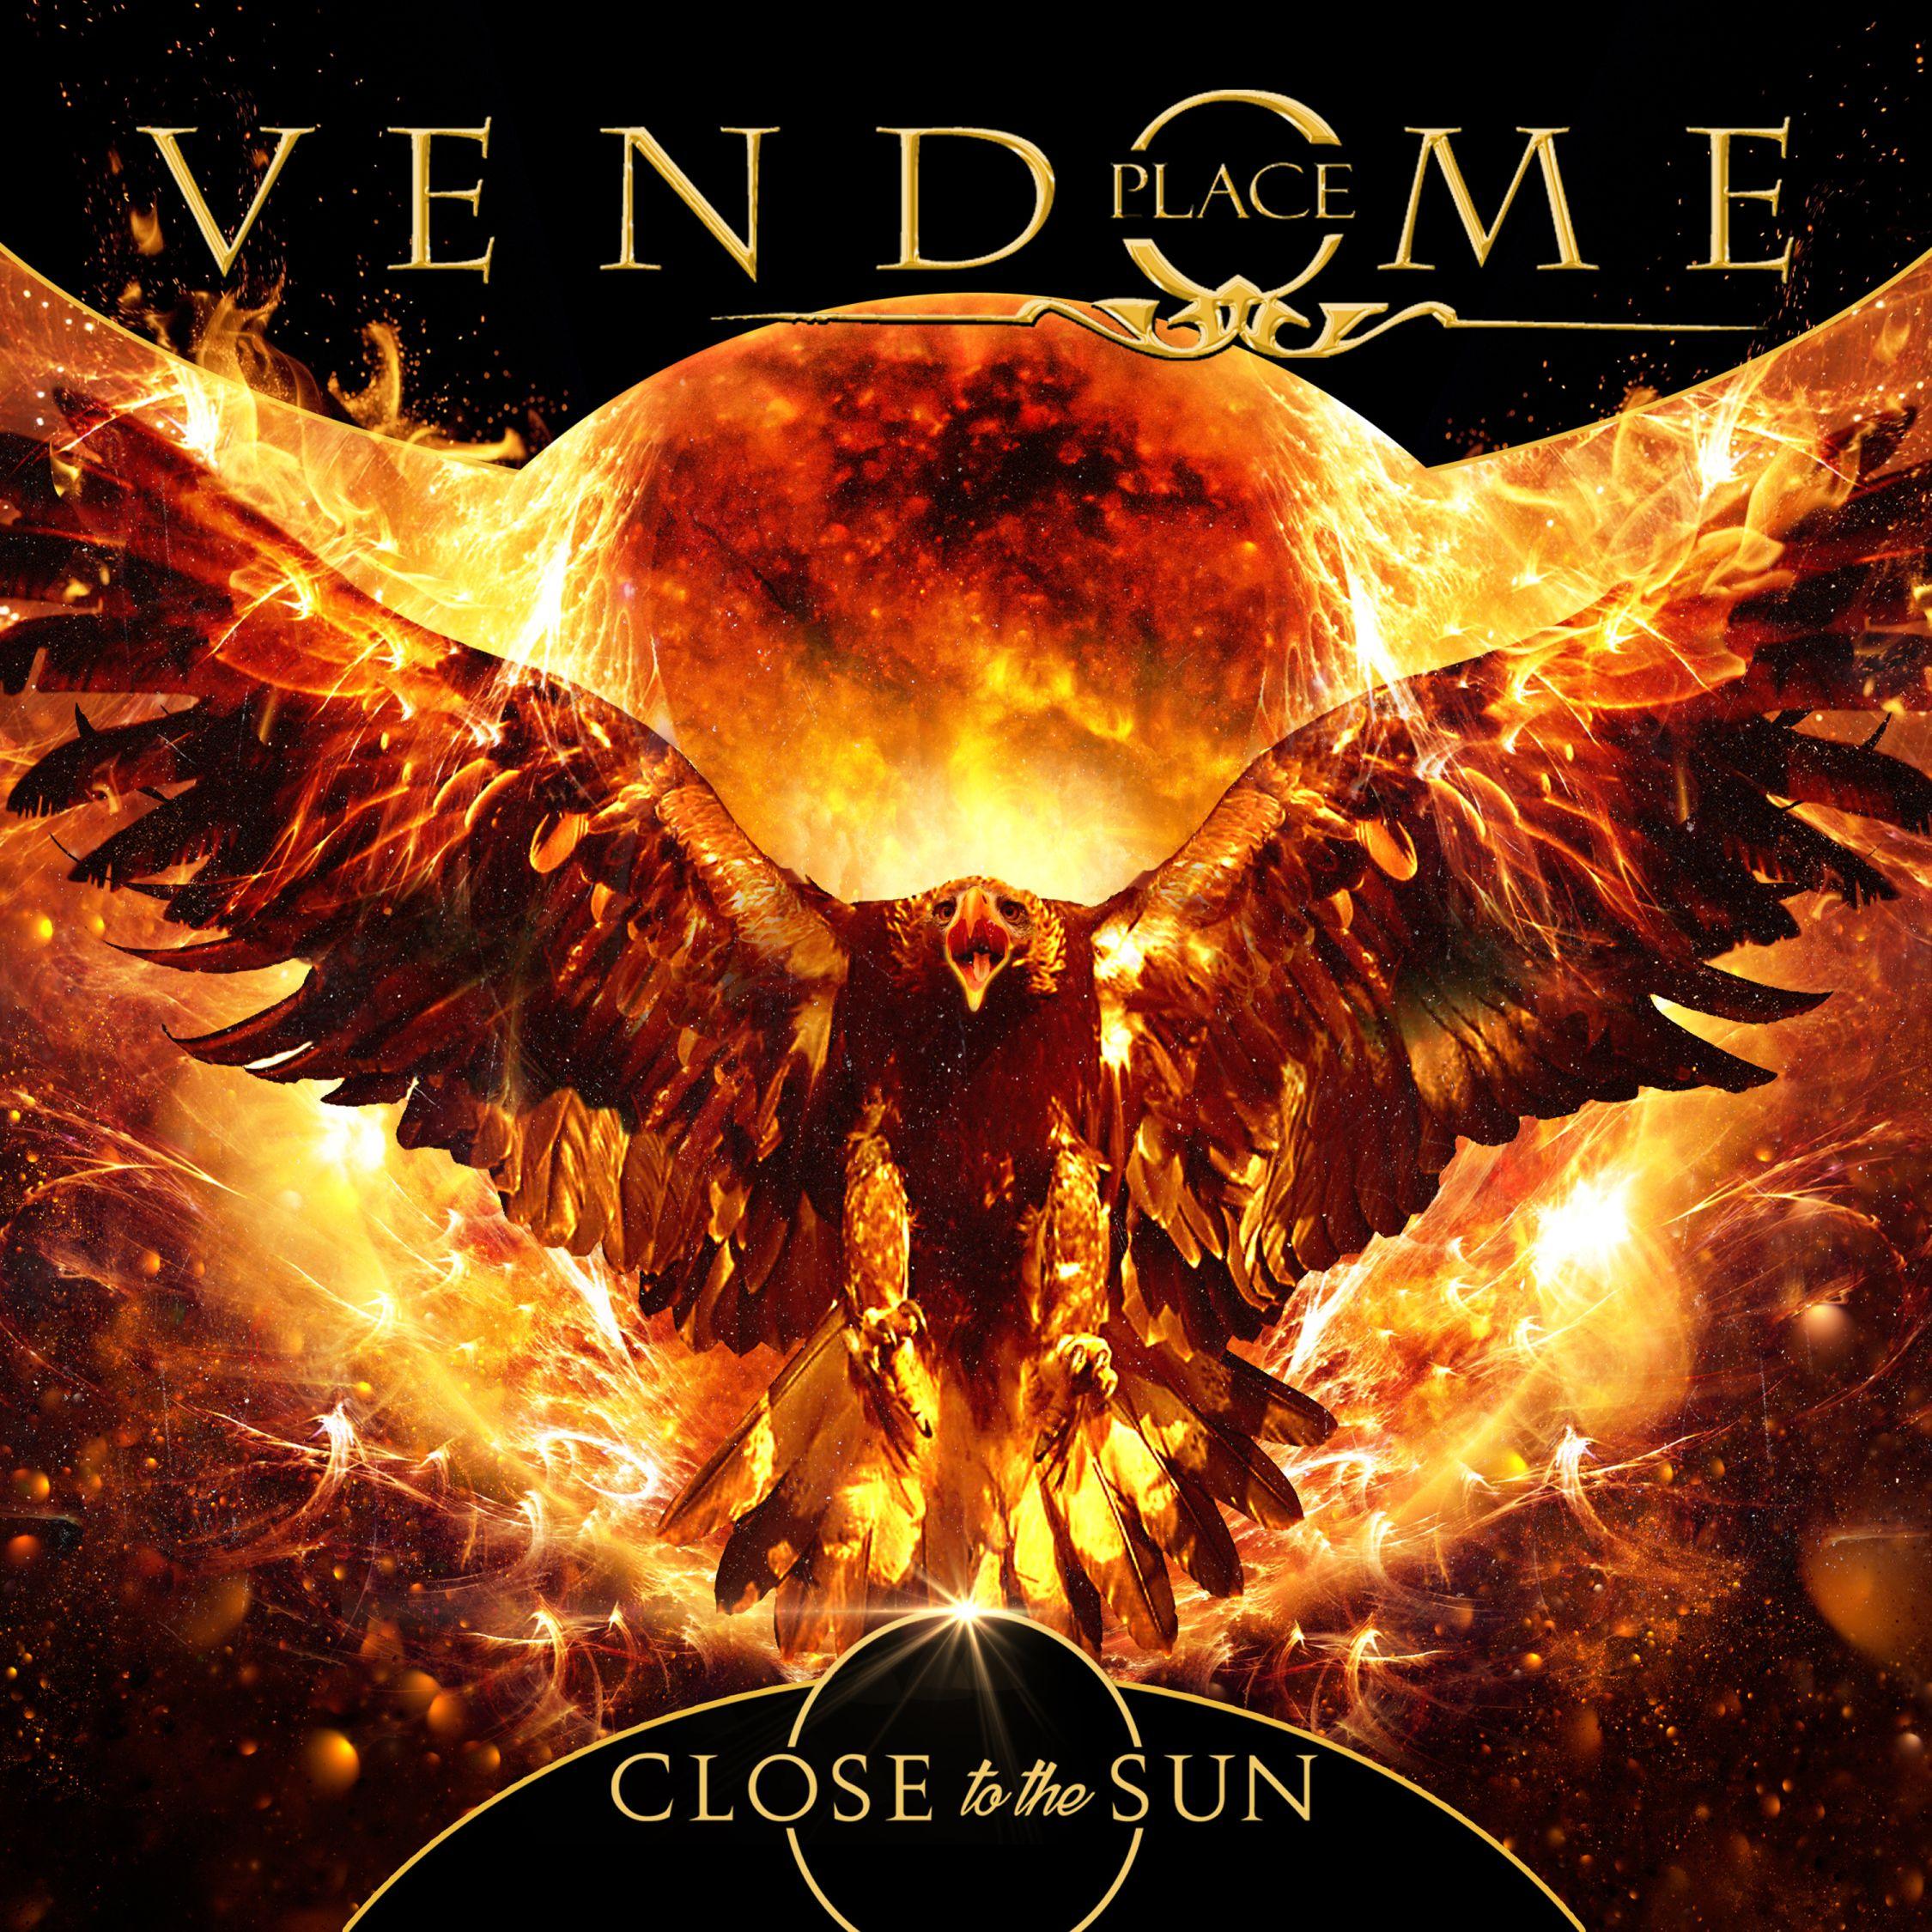 PLACE_VENDOME_ctts_COVER_HI